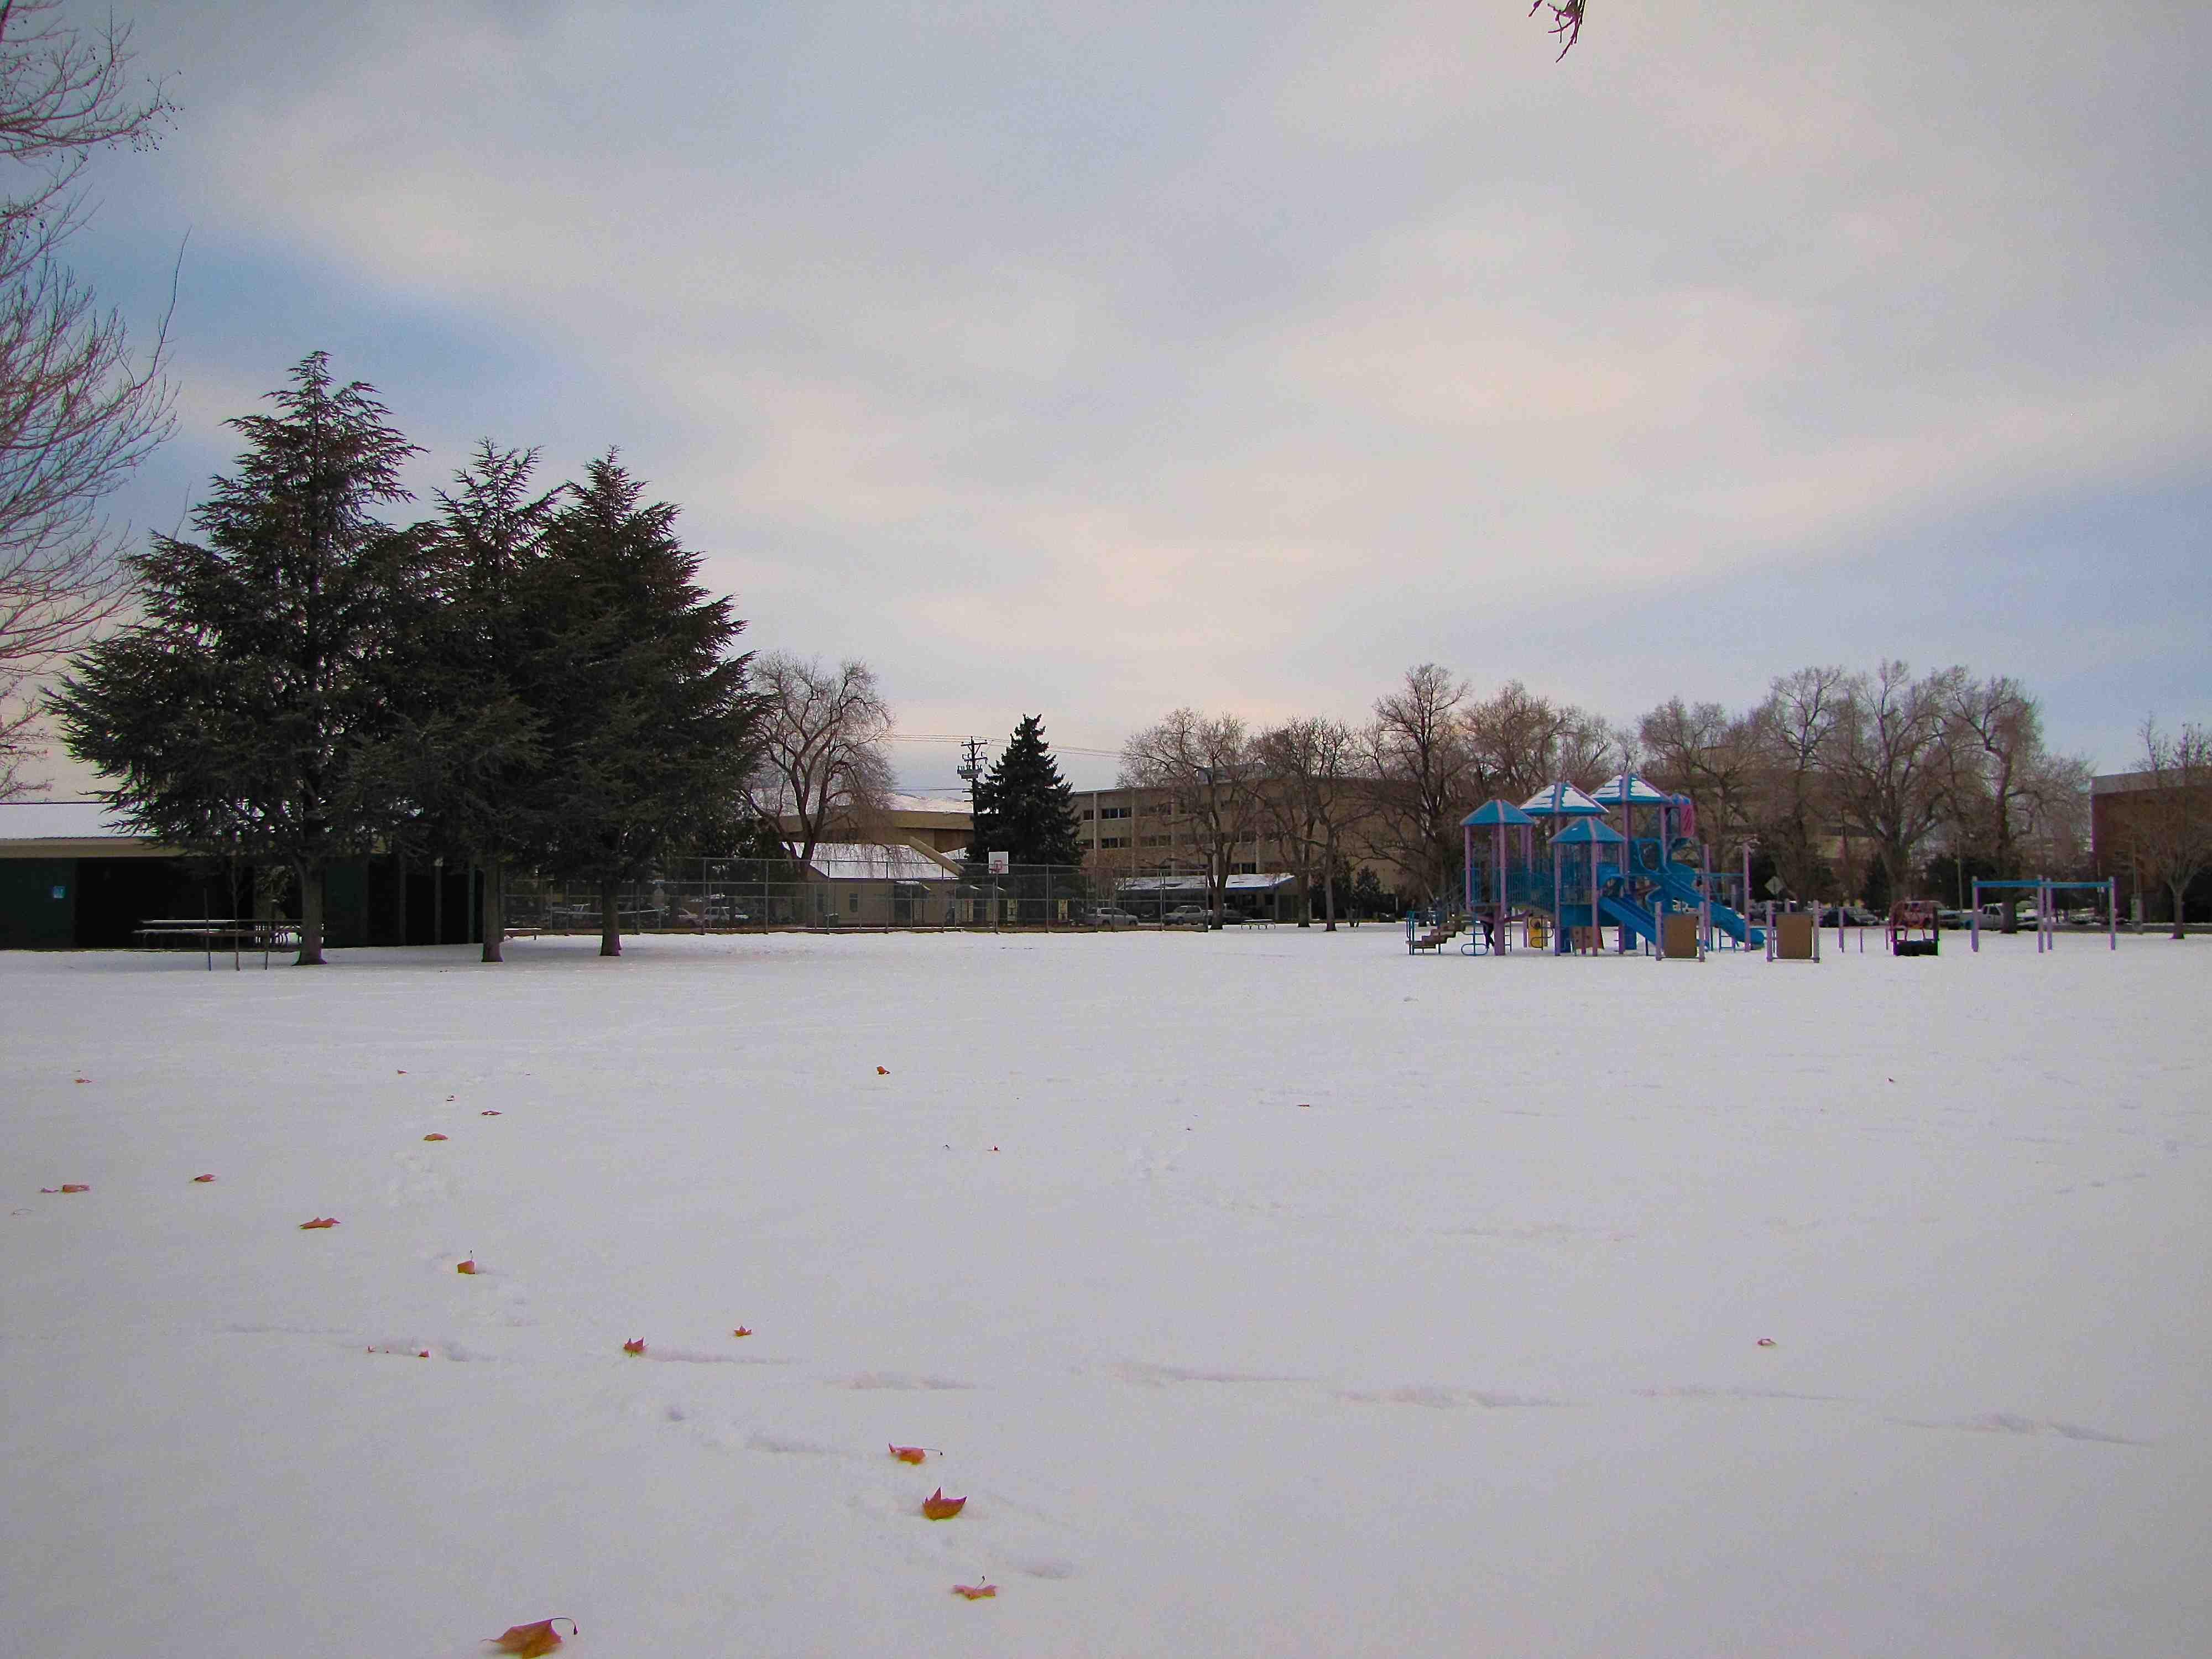 2 Pickett Park (Reno) Site 1 Winter 2013 (Low)